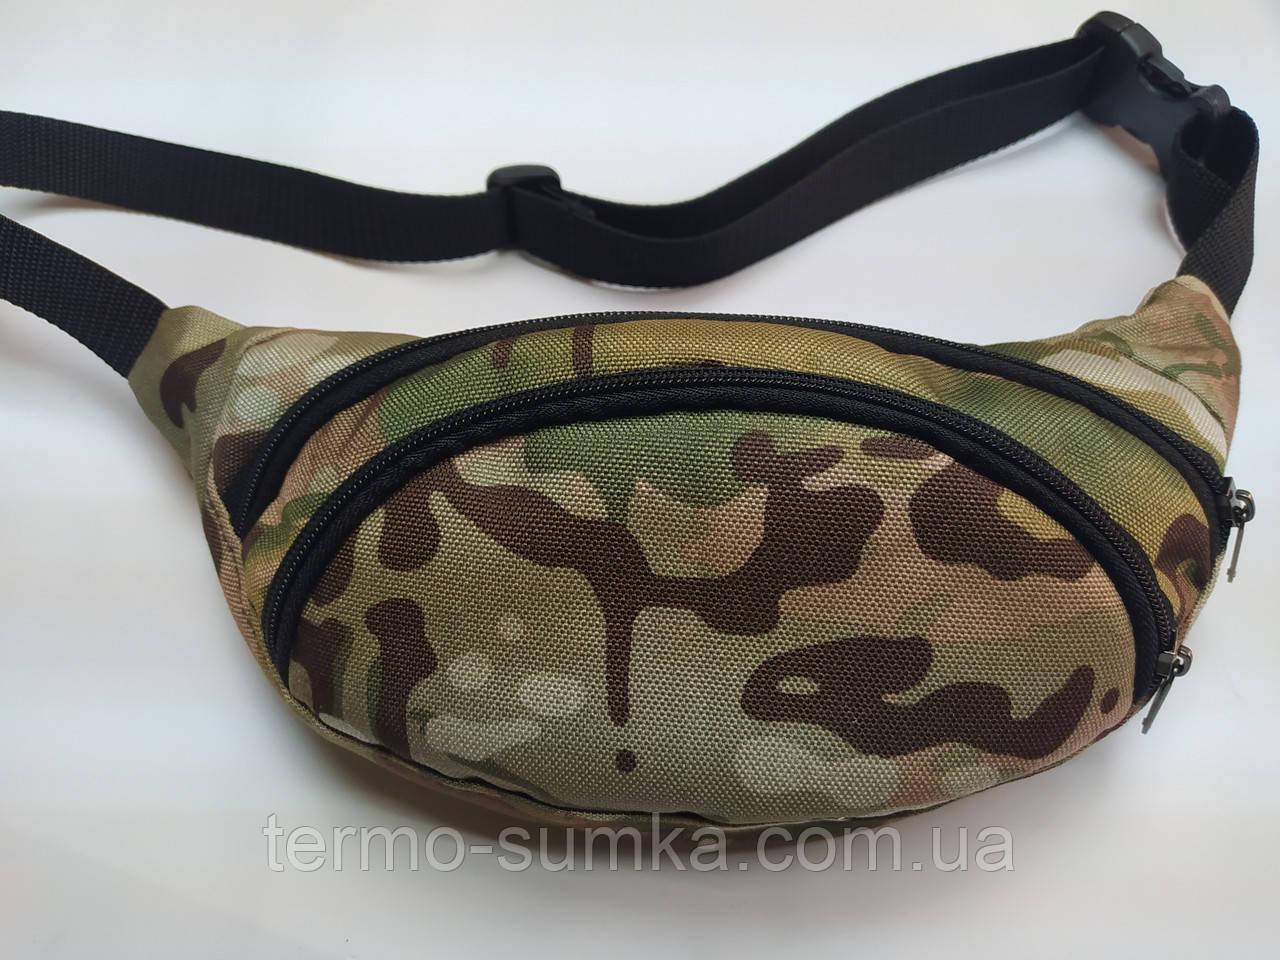 Поясна сумка бананка. Камуфляж НАТО